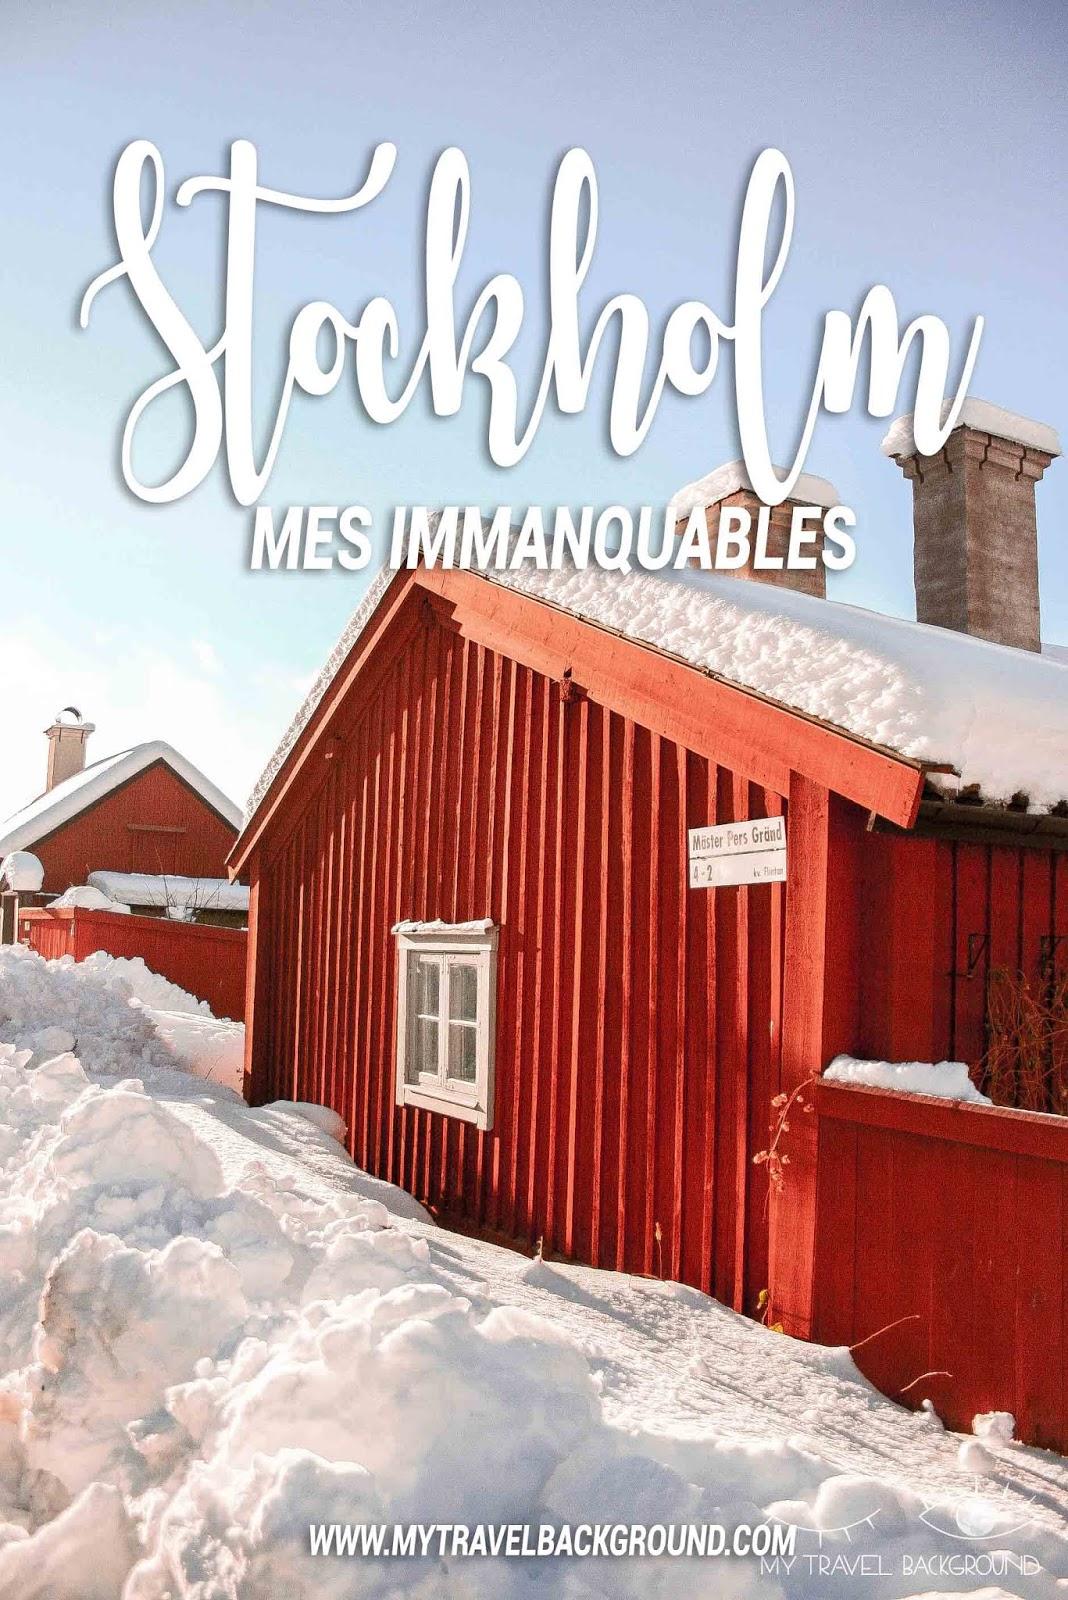 My Travel Background : Visiter Stockholm, mes immanquables